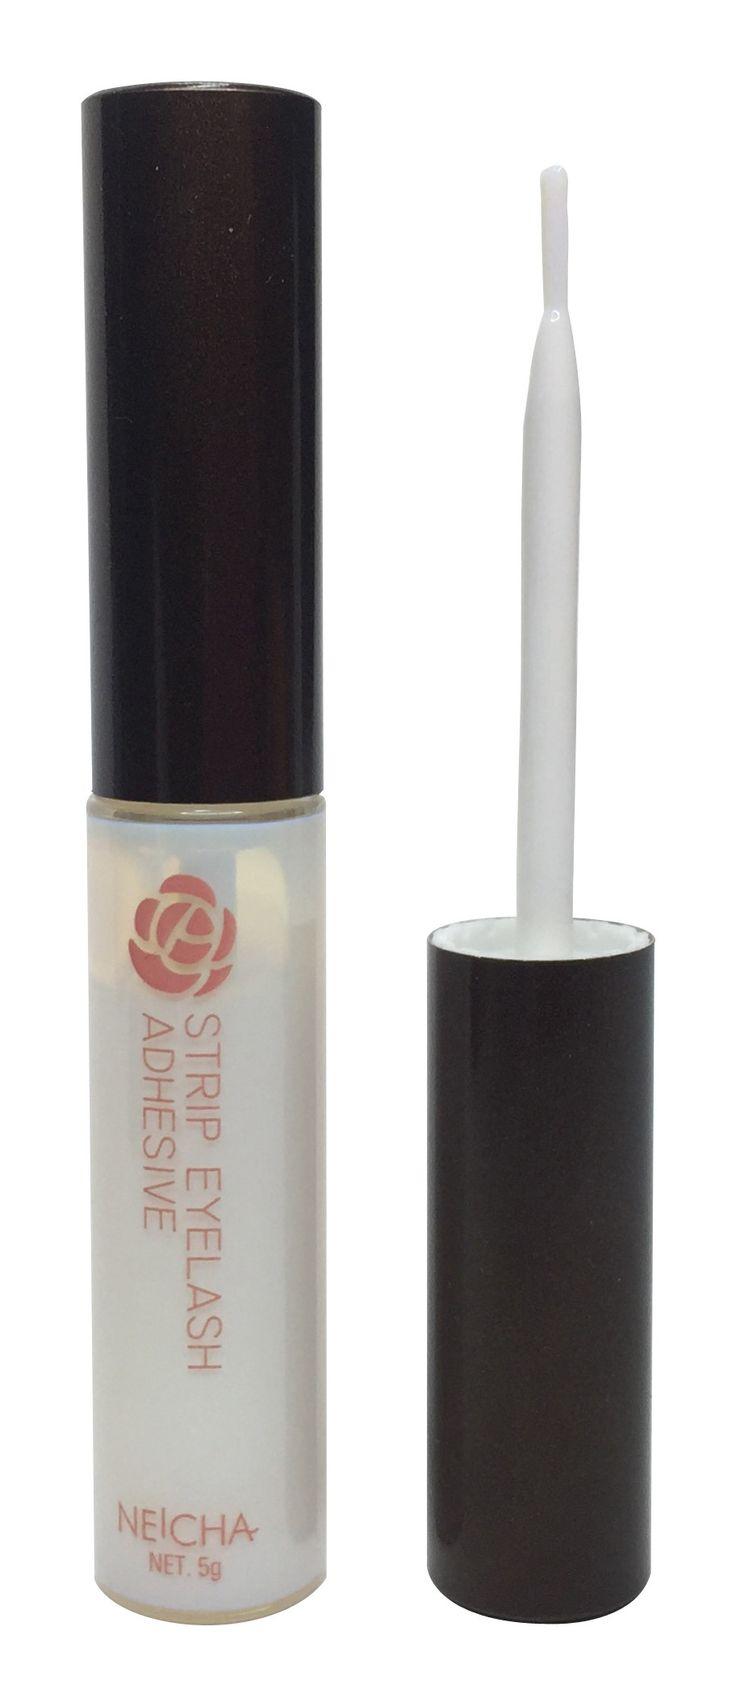 Eyelash Glue for Strip or Cluster Lashes